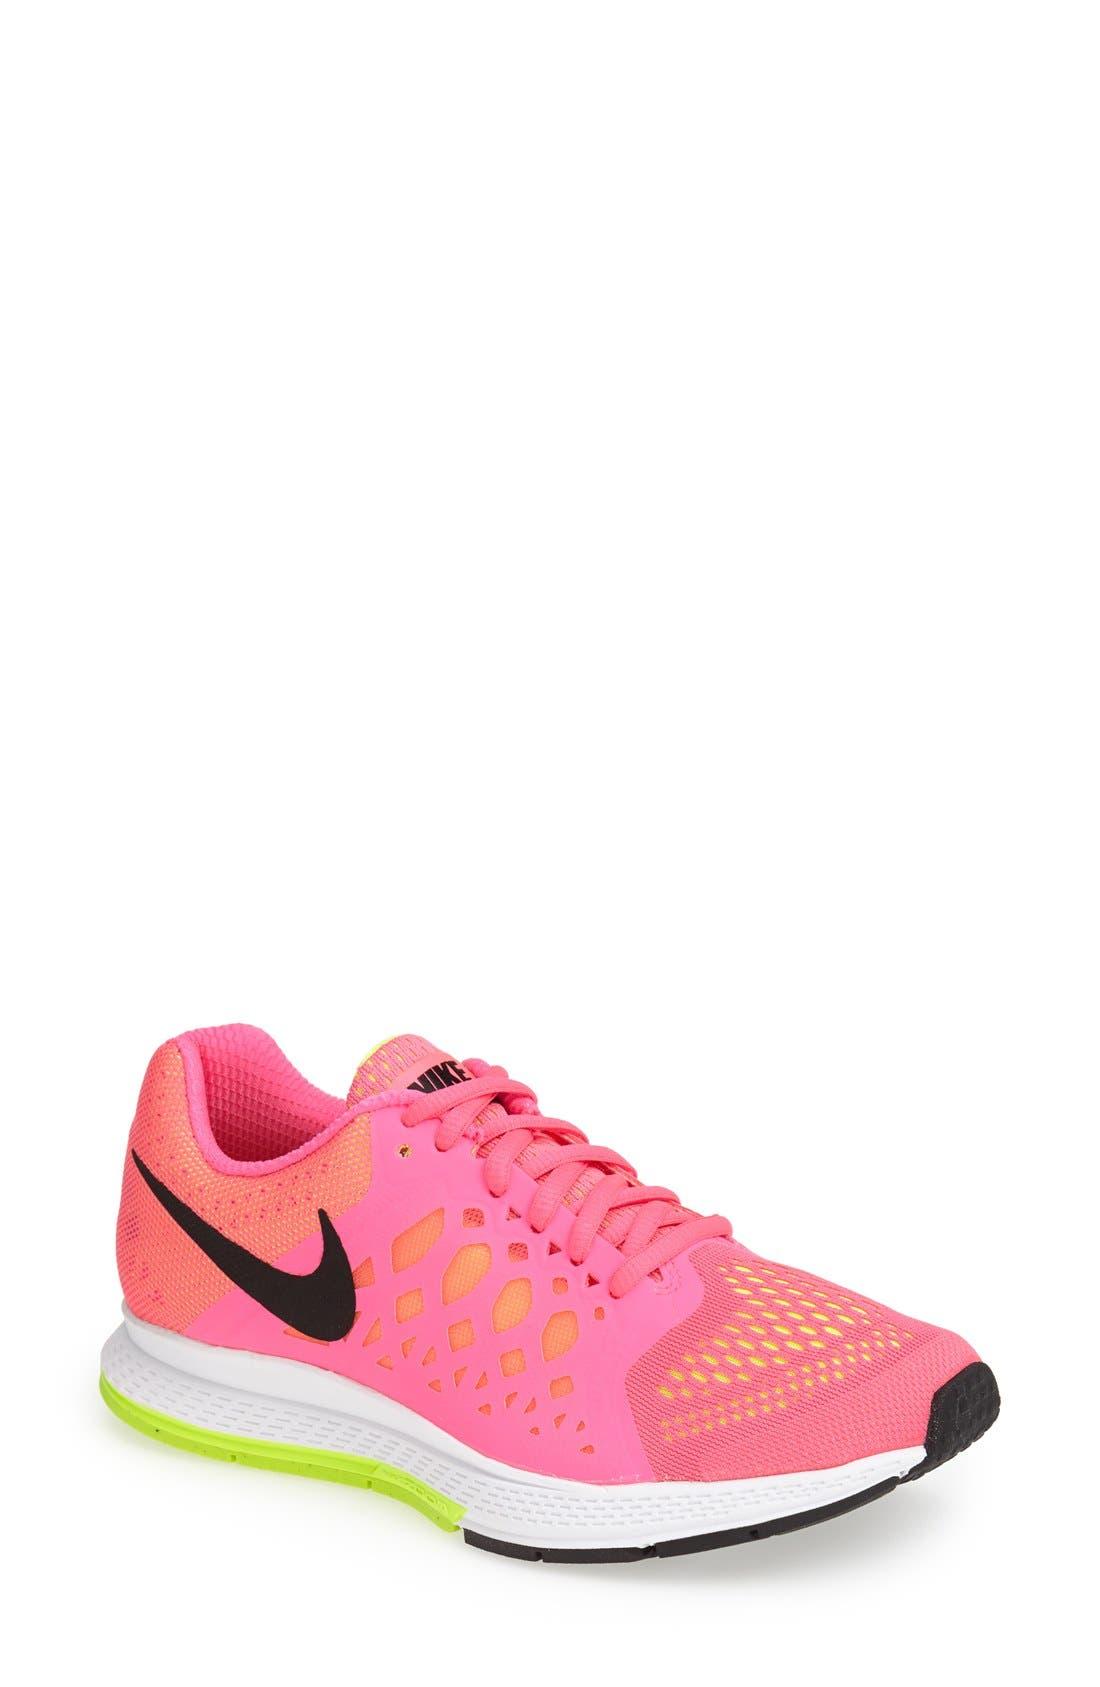 Alternate Image 1 Selected - Nike 'Air Pegasus 31' Running Shoe (Women)